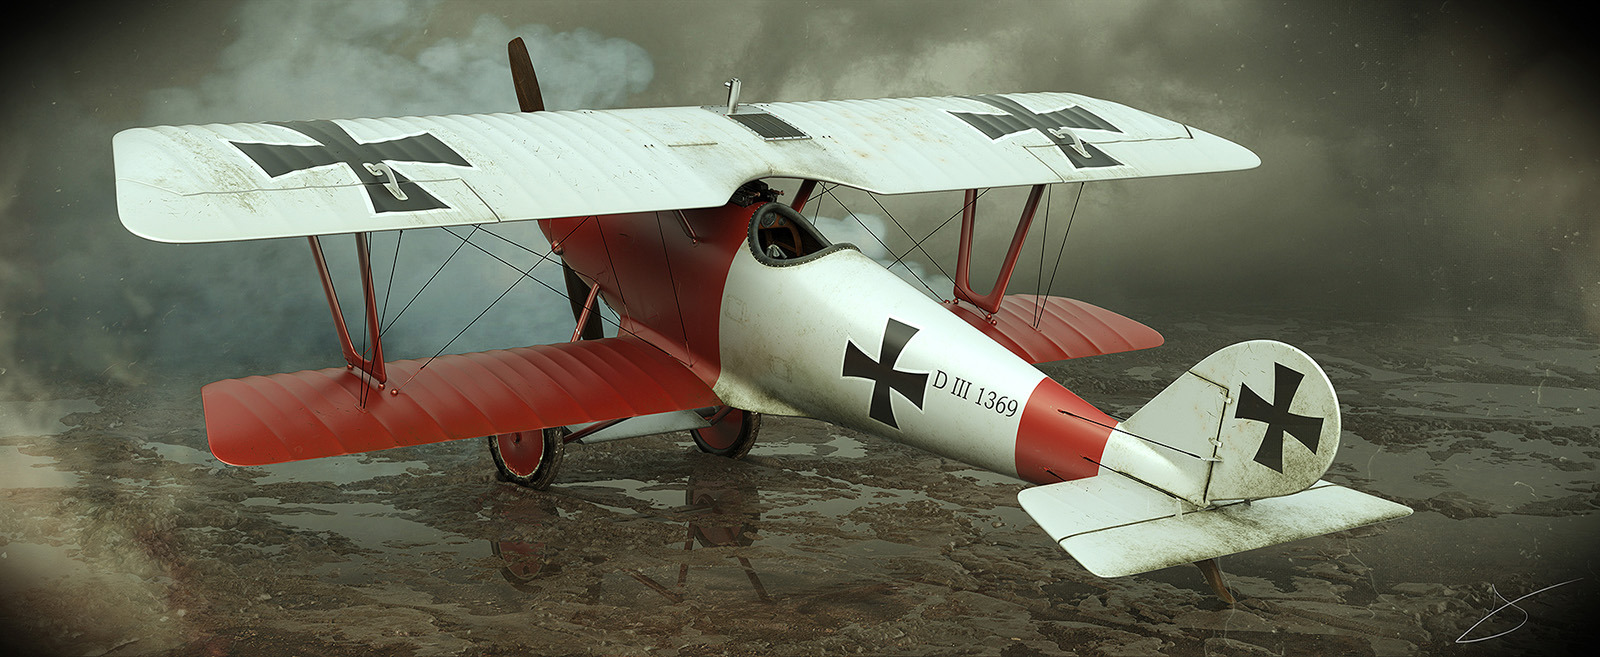 Pfalz D III a First Great Air War airplane